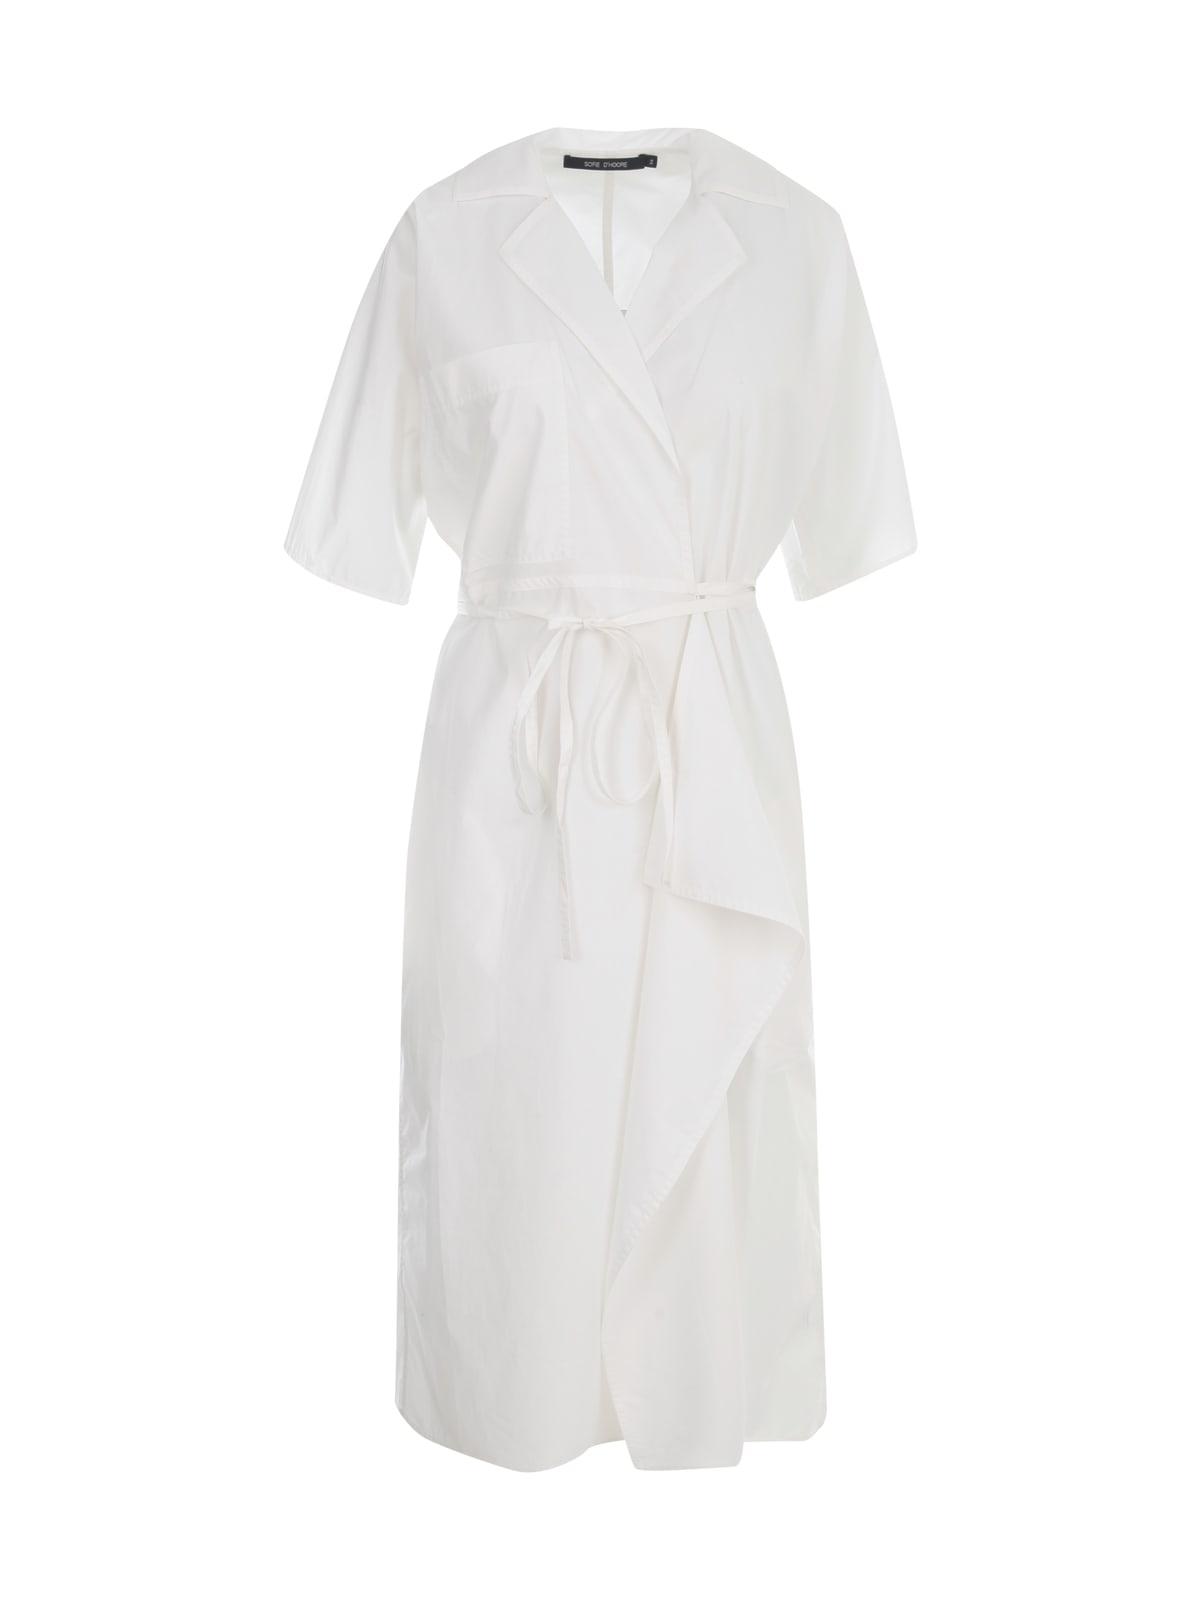 Sofie D'hoore S/S WRAP AROUND DRESS W/WAVY DETAIL ON SKIRT